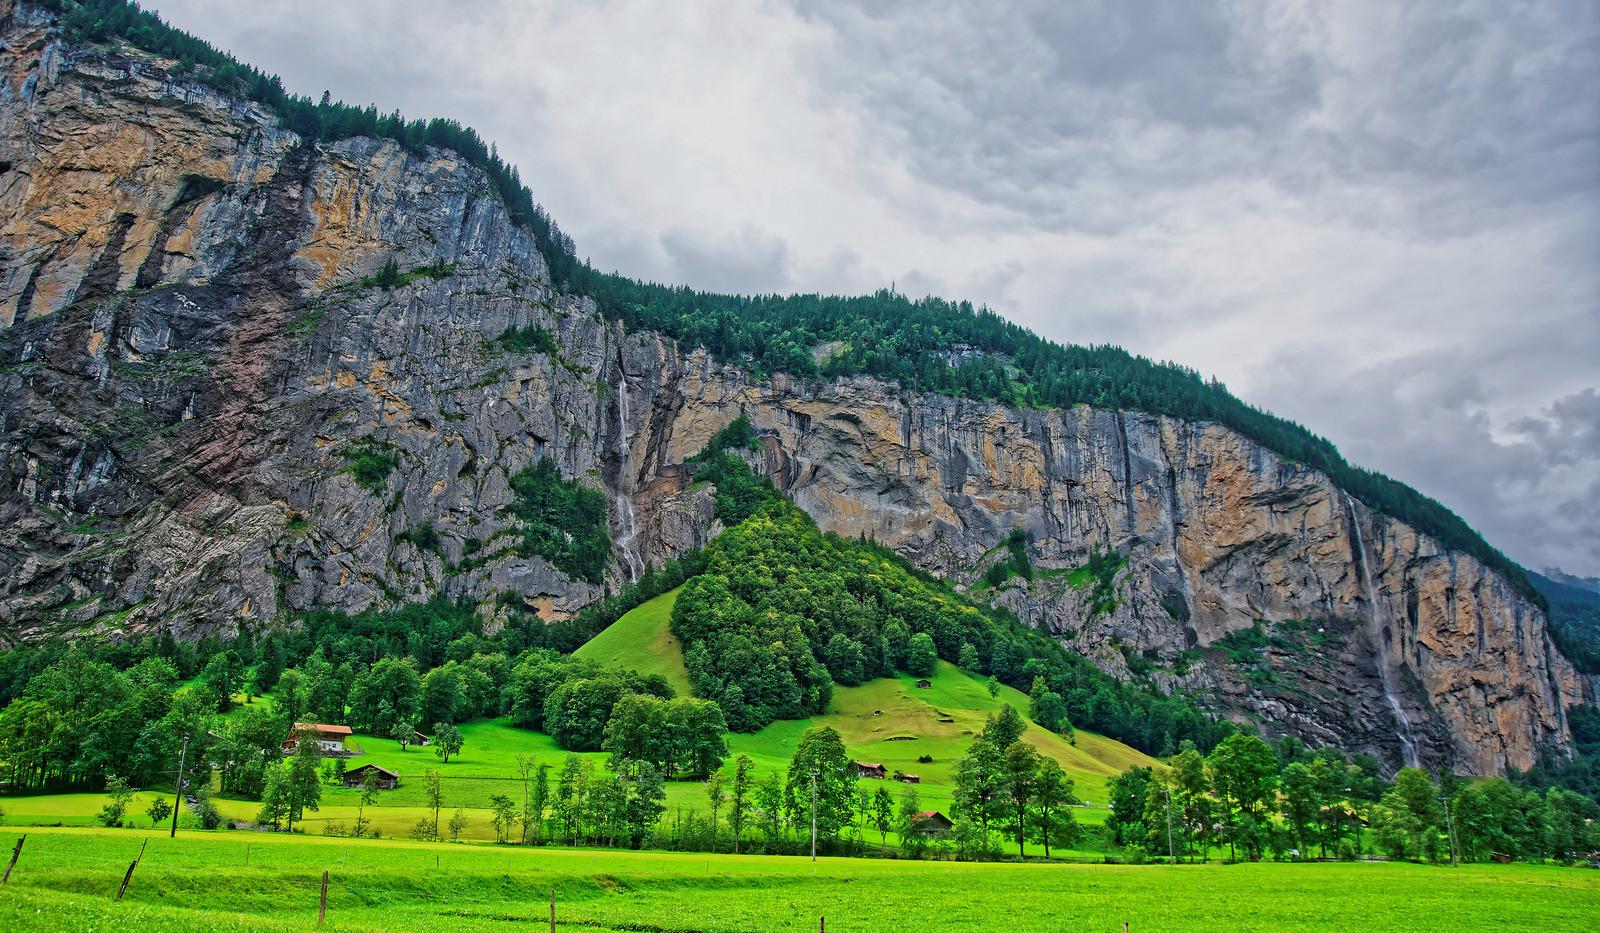 Canva - Lauterbrunnen Valley in Interlak